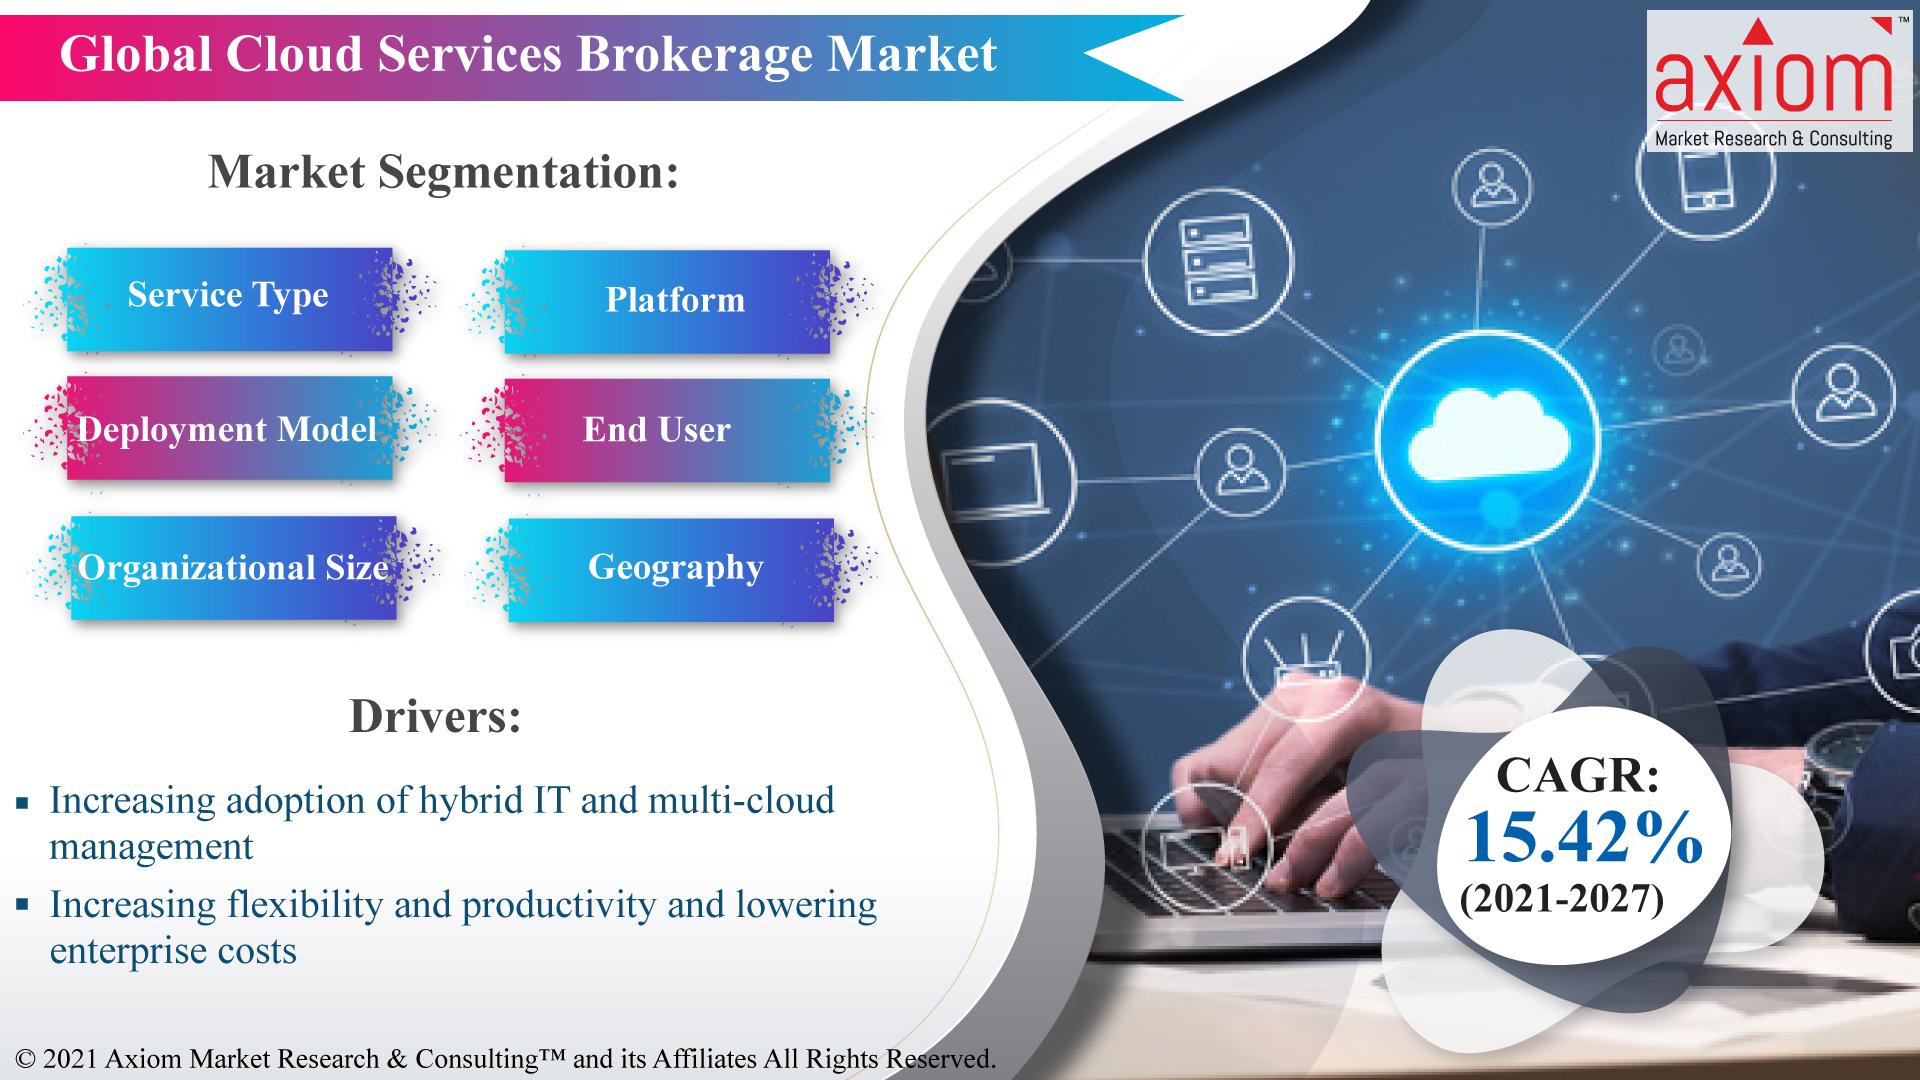 Global-Cloud-Services-Brokerage-Market